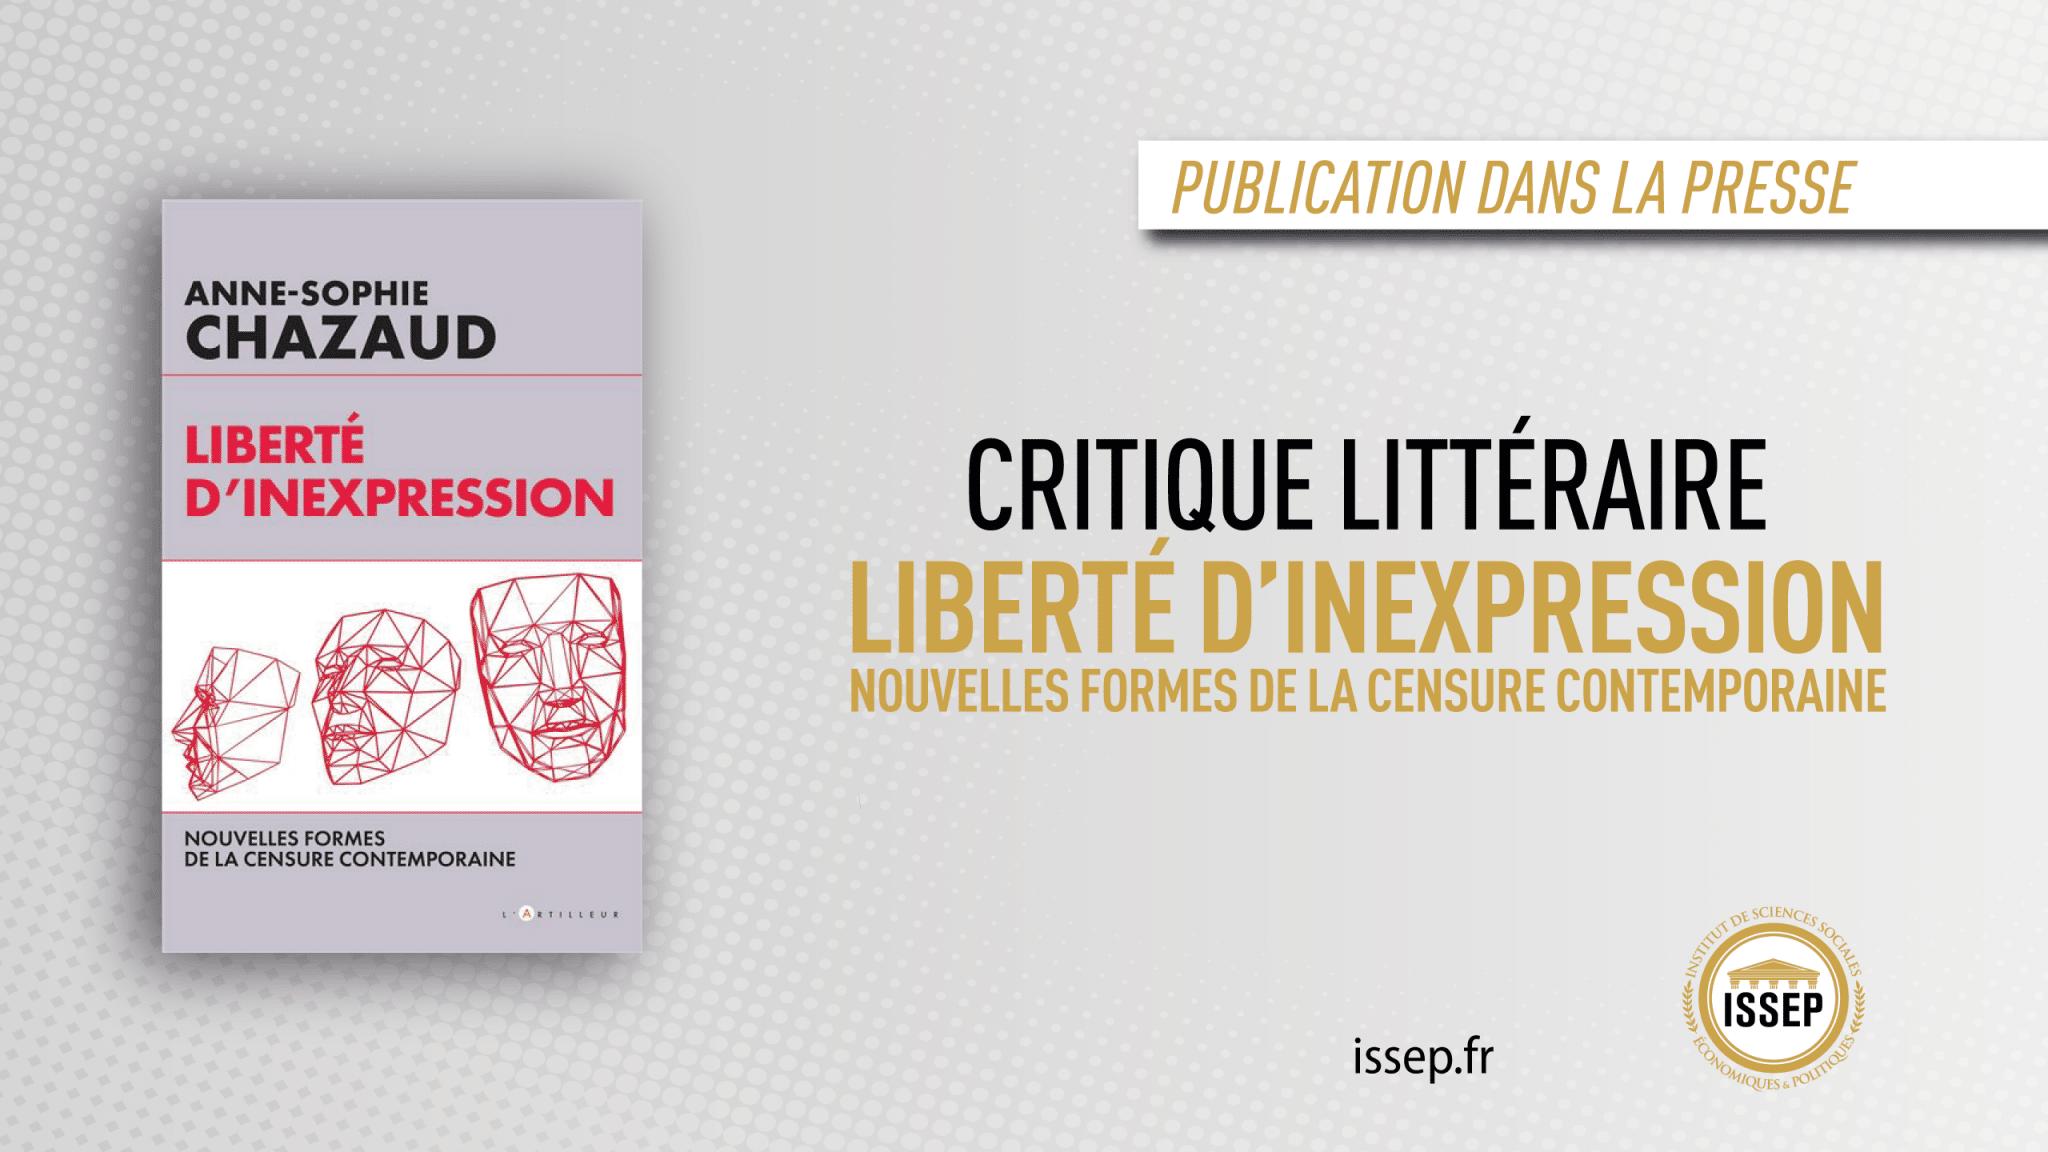 Liberté d'inexpression - critique littéraire ISSEP